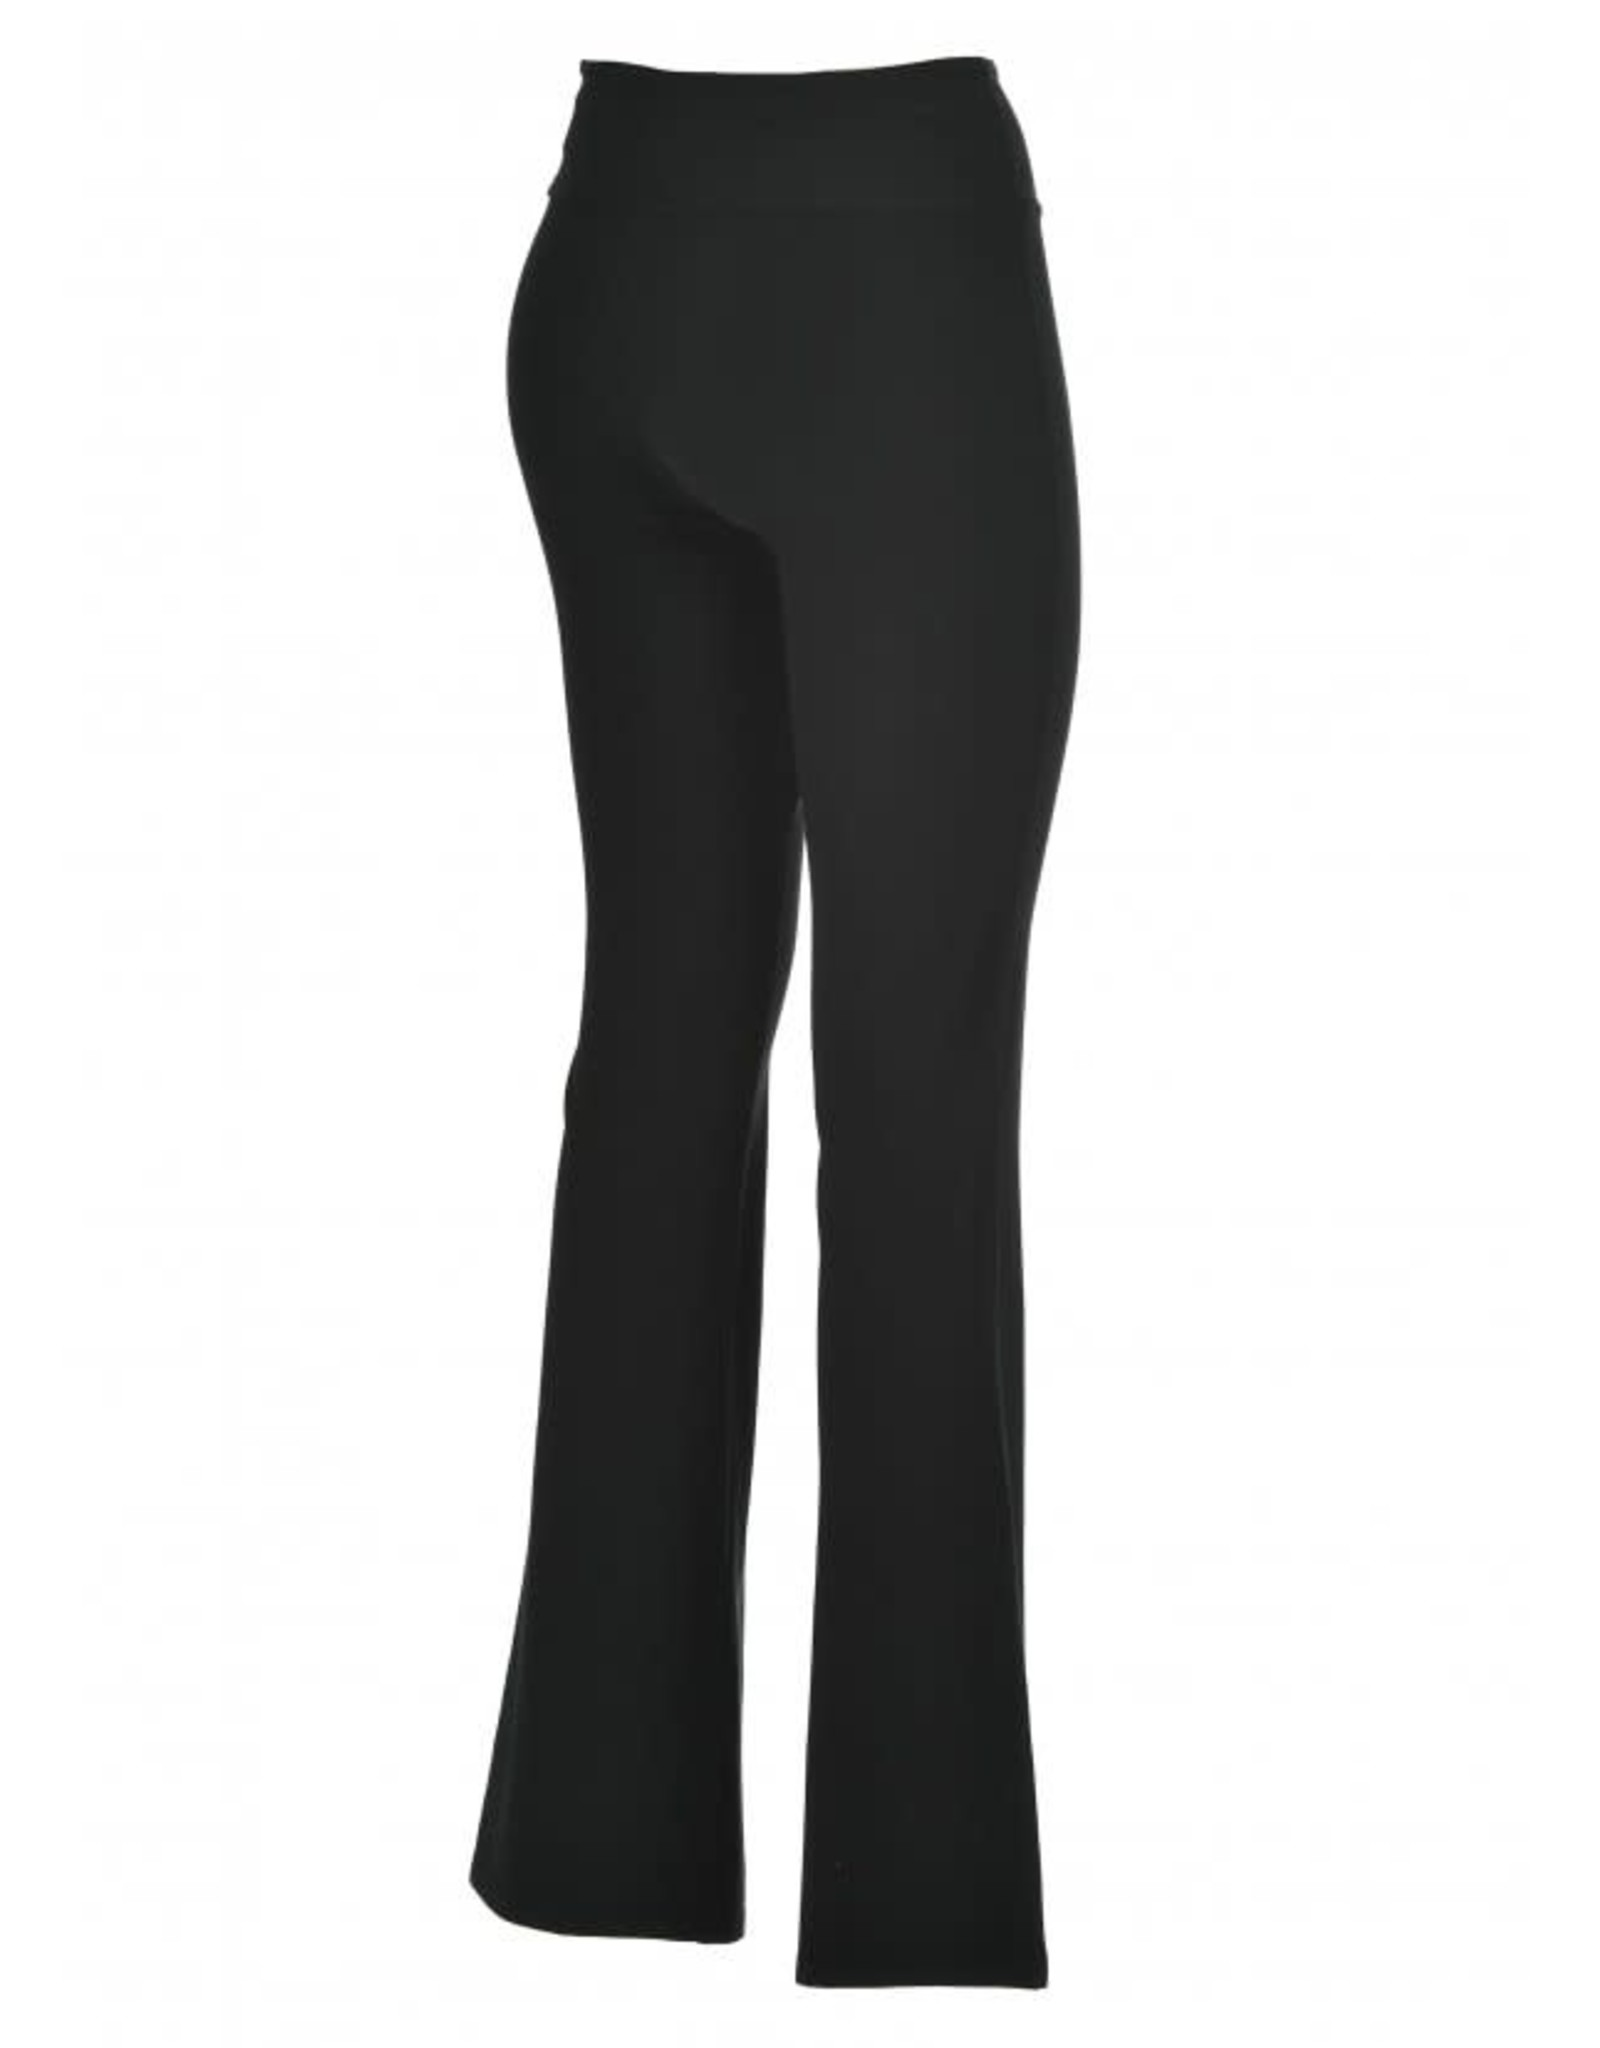 Deha SS21 B00716 Jazzpants